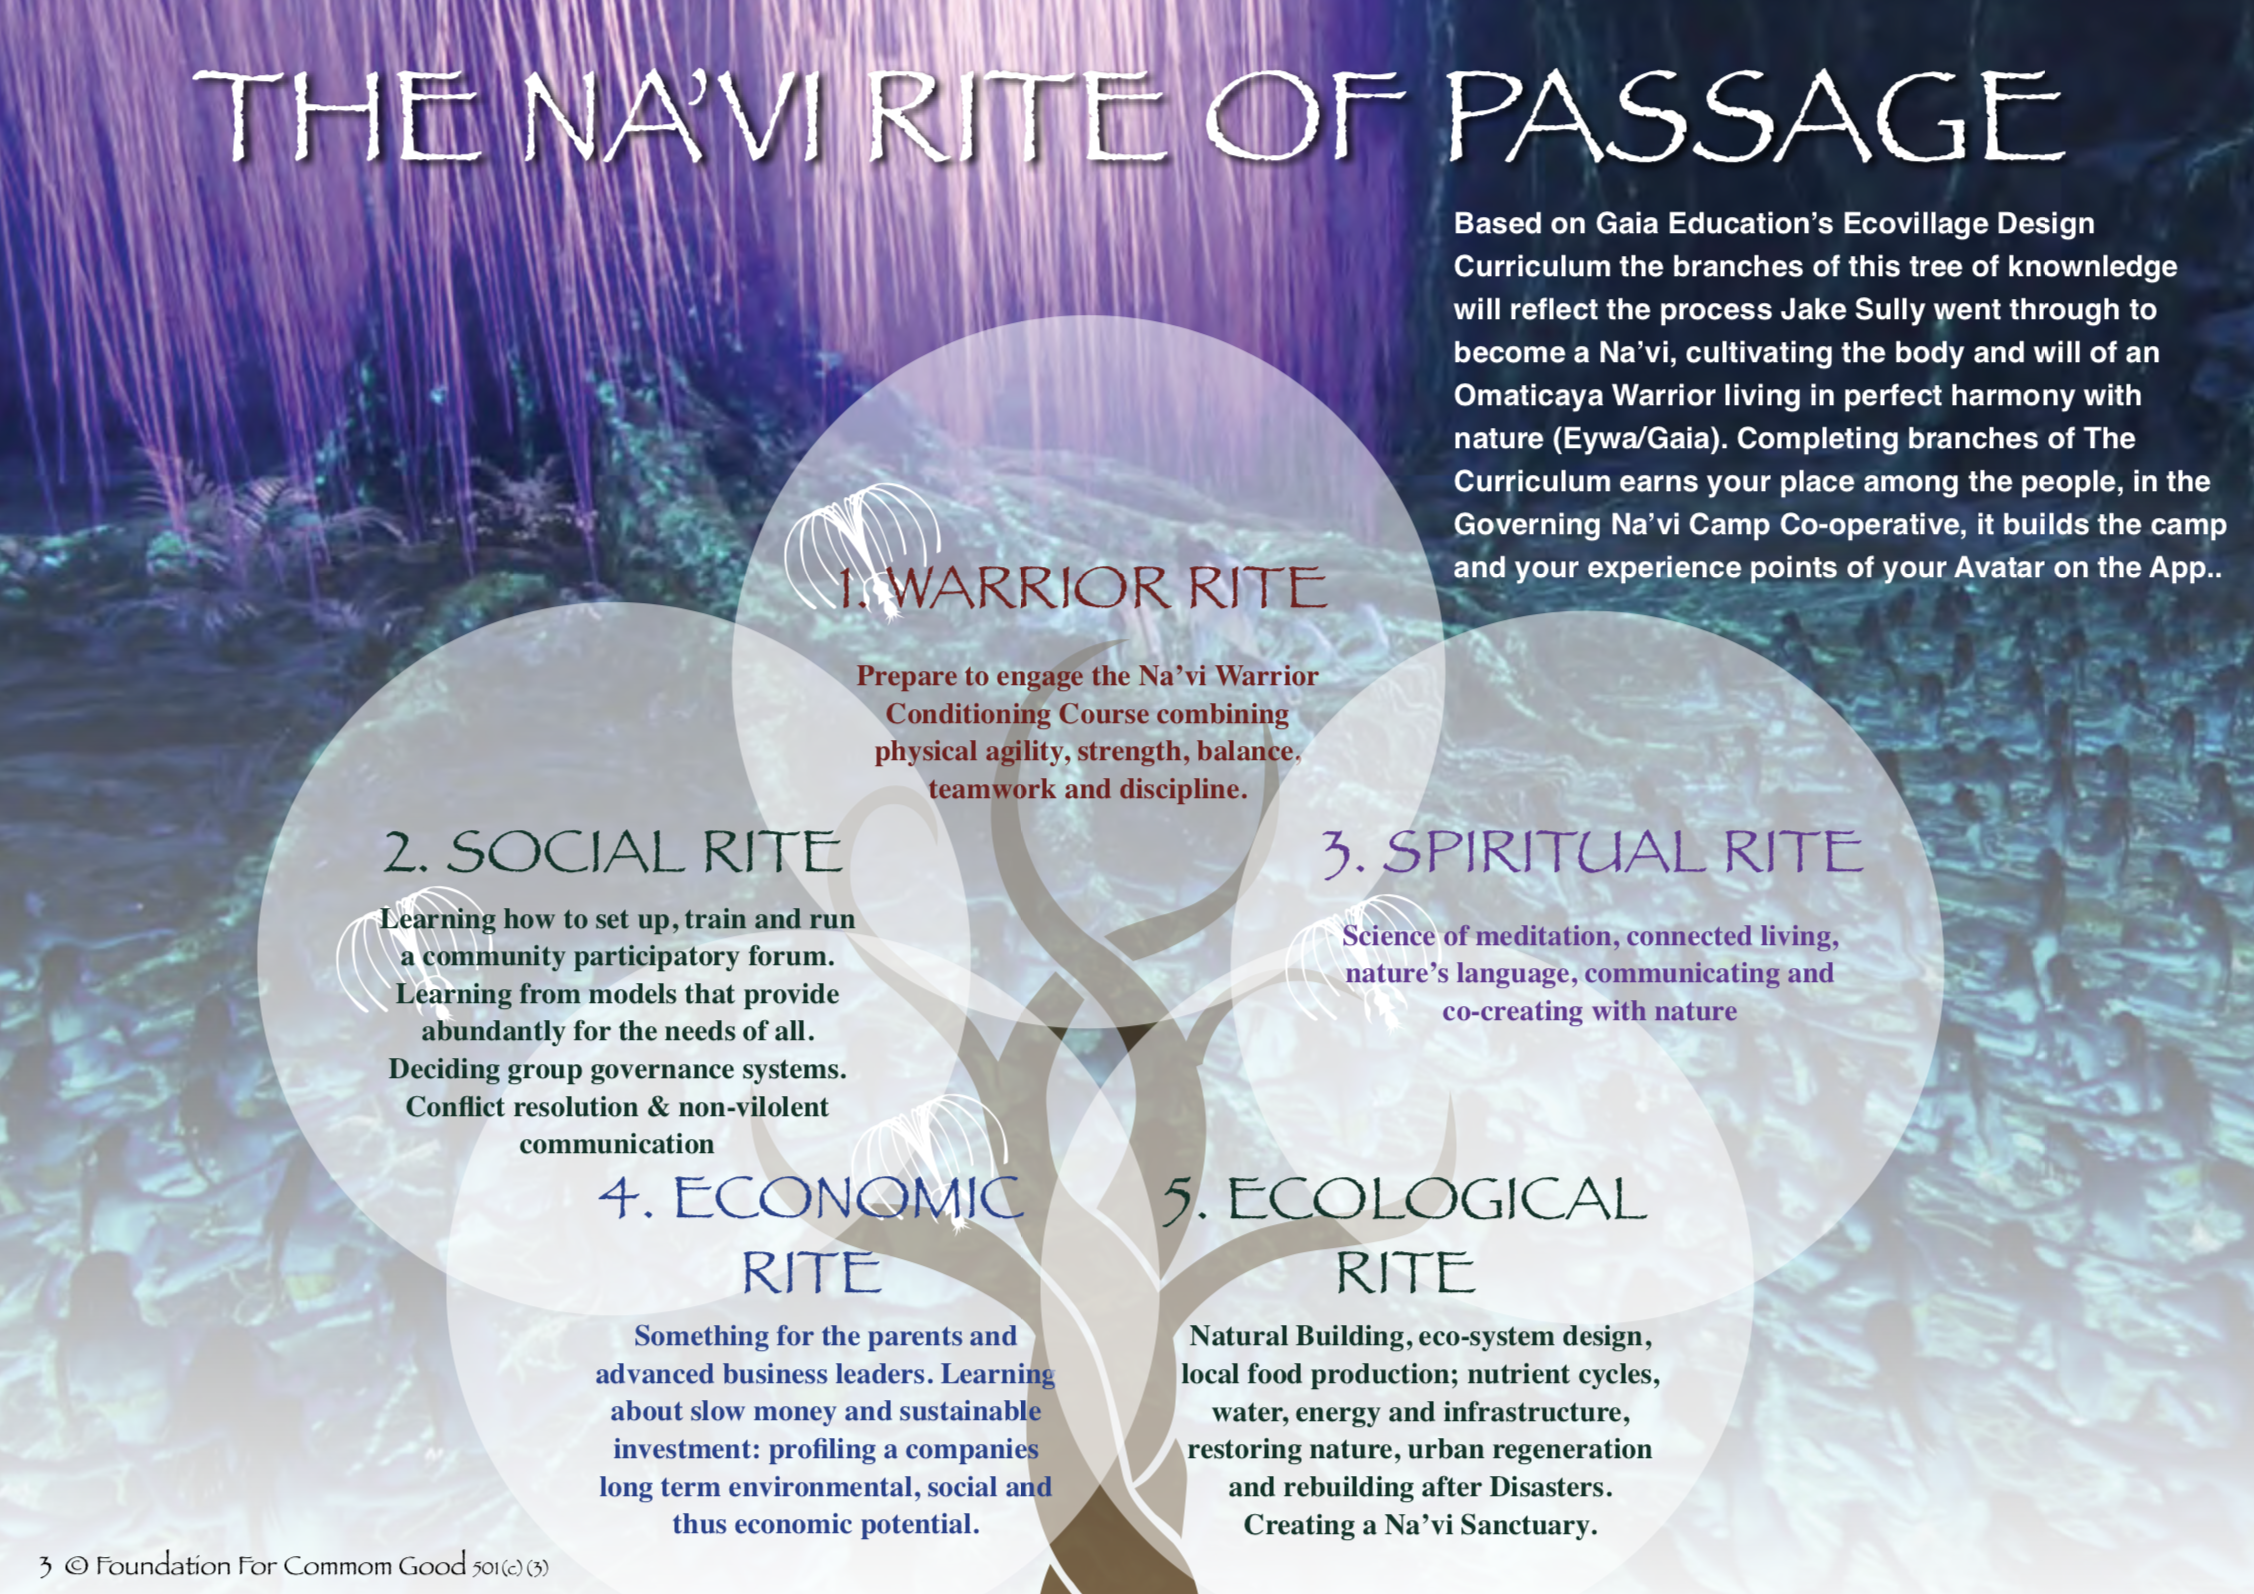 The Eco-village Design Curriculum given an Avatar Theme